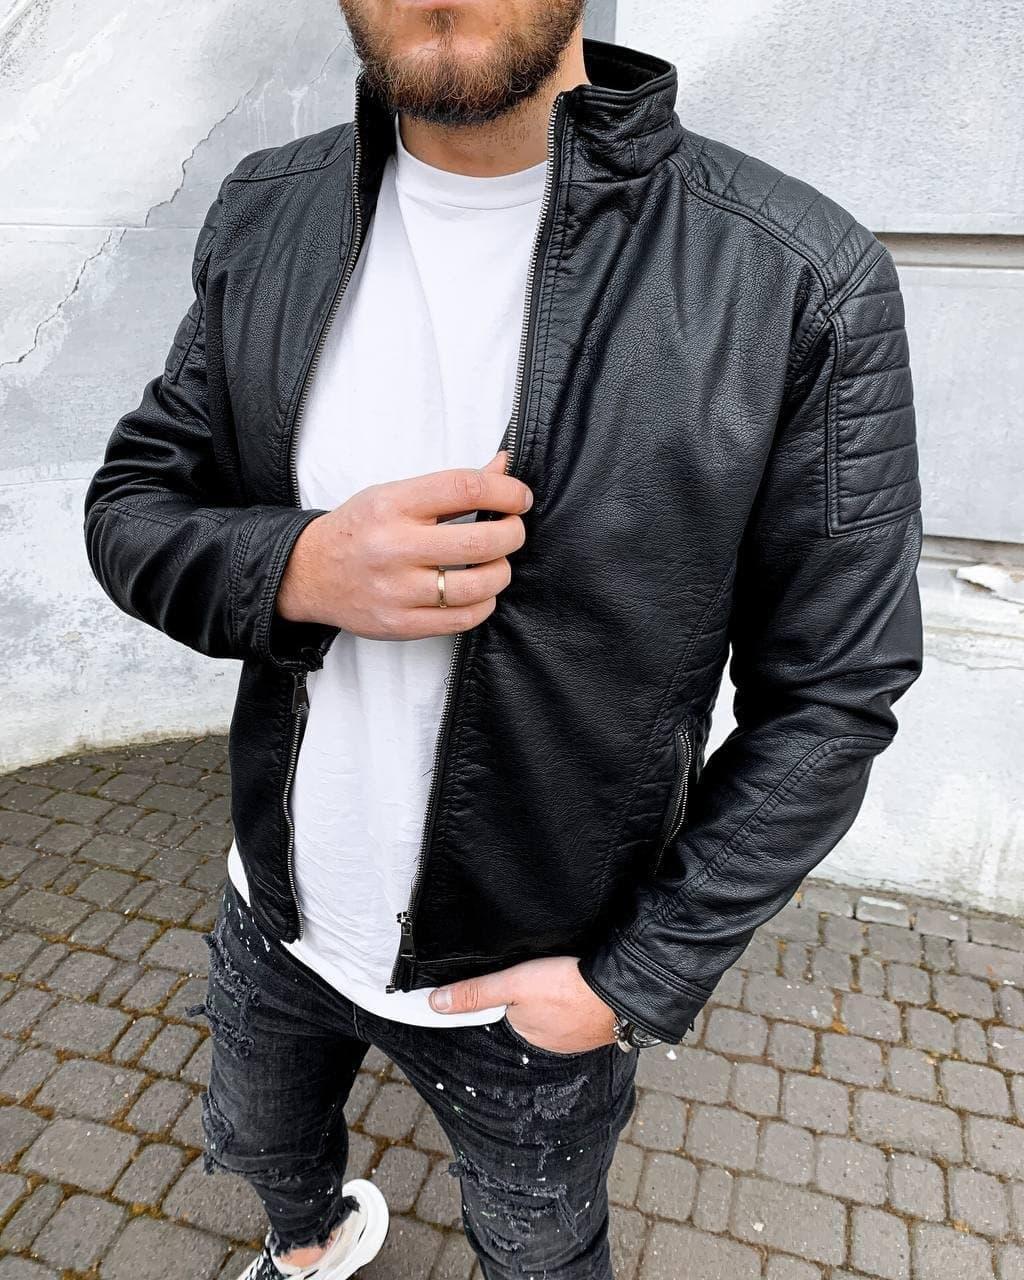 Куртка-косуха чоловіча стильна чорна шкіряна стьобана туреччина